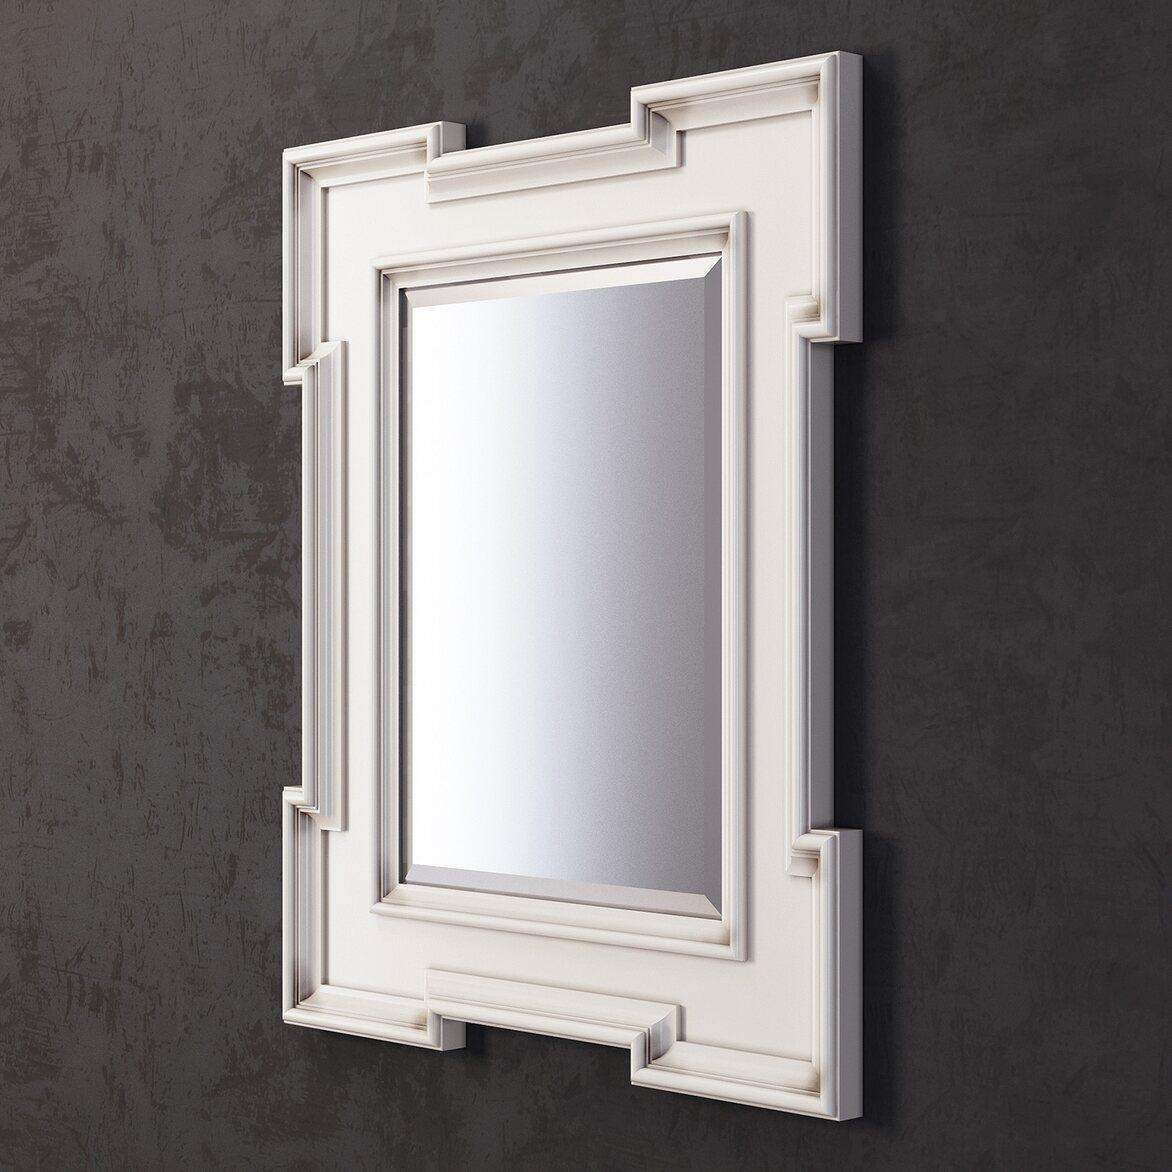 Зеркало Preston, Ivory 2 | Настенные зеркала Kingsby